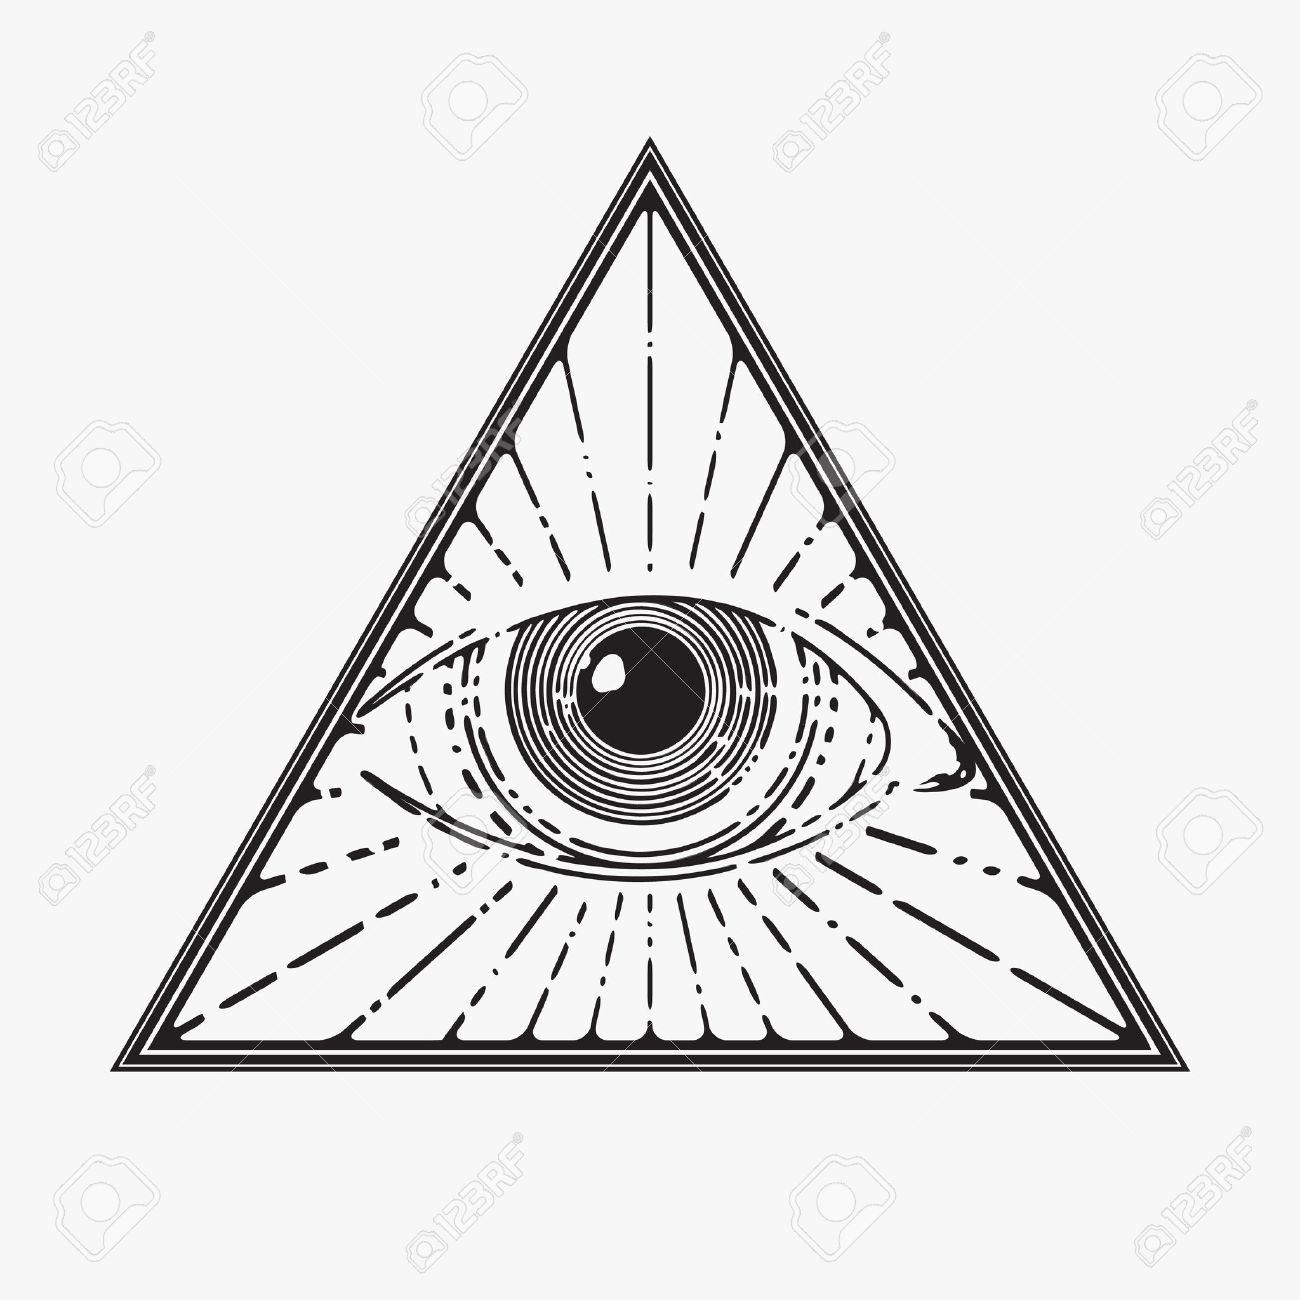 1,324 Illuminati Stock Illustrations, Cliparts And Royalty Free.